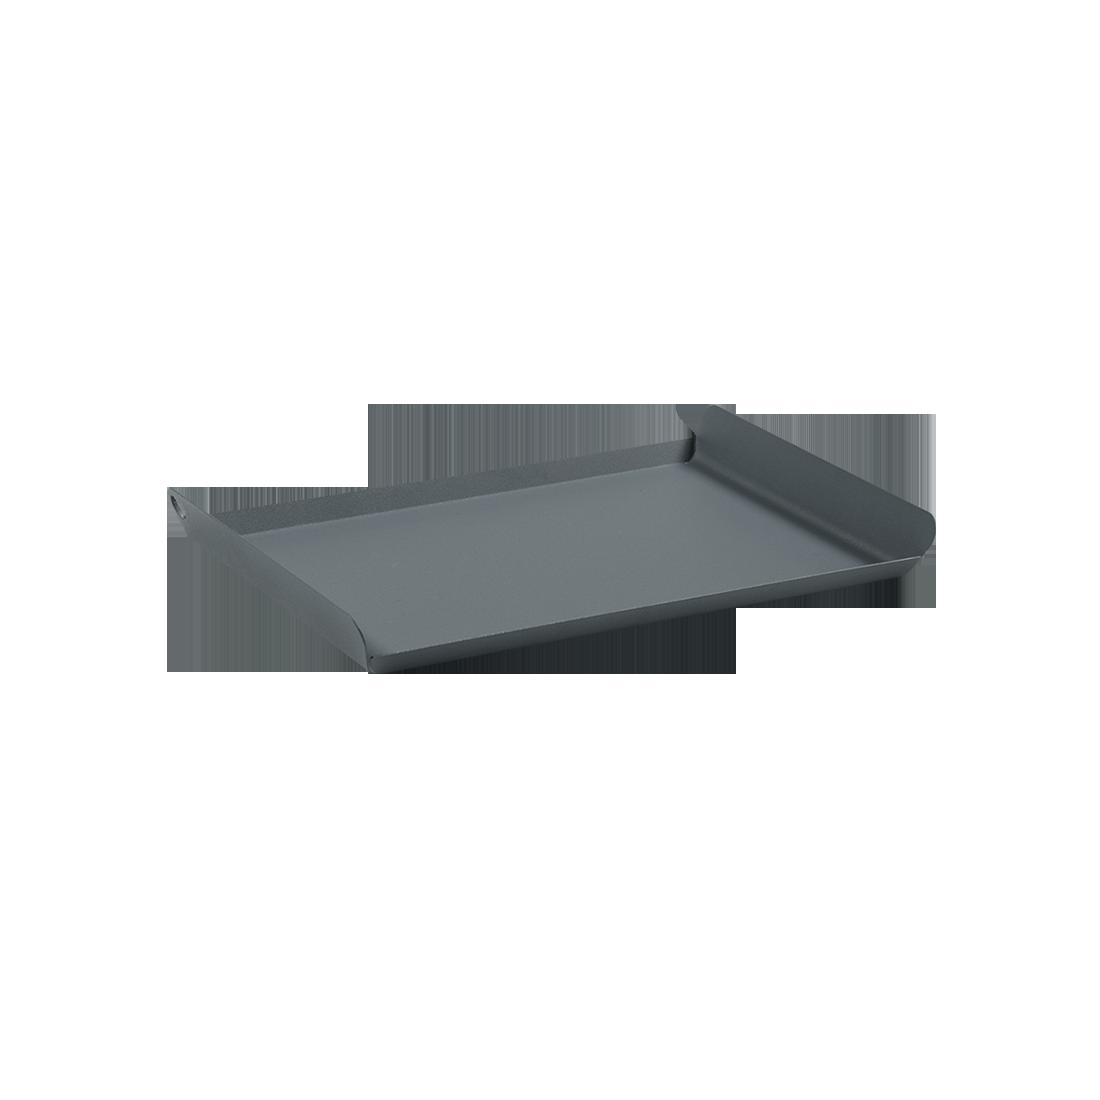 Plateau Alto gris, plateau metal, plateau de service